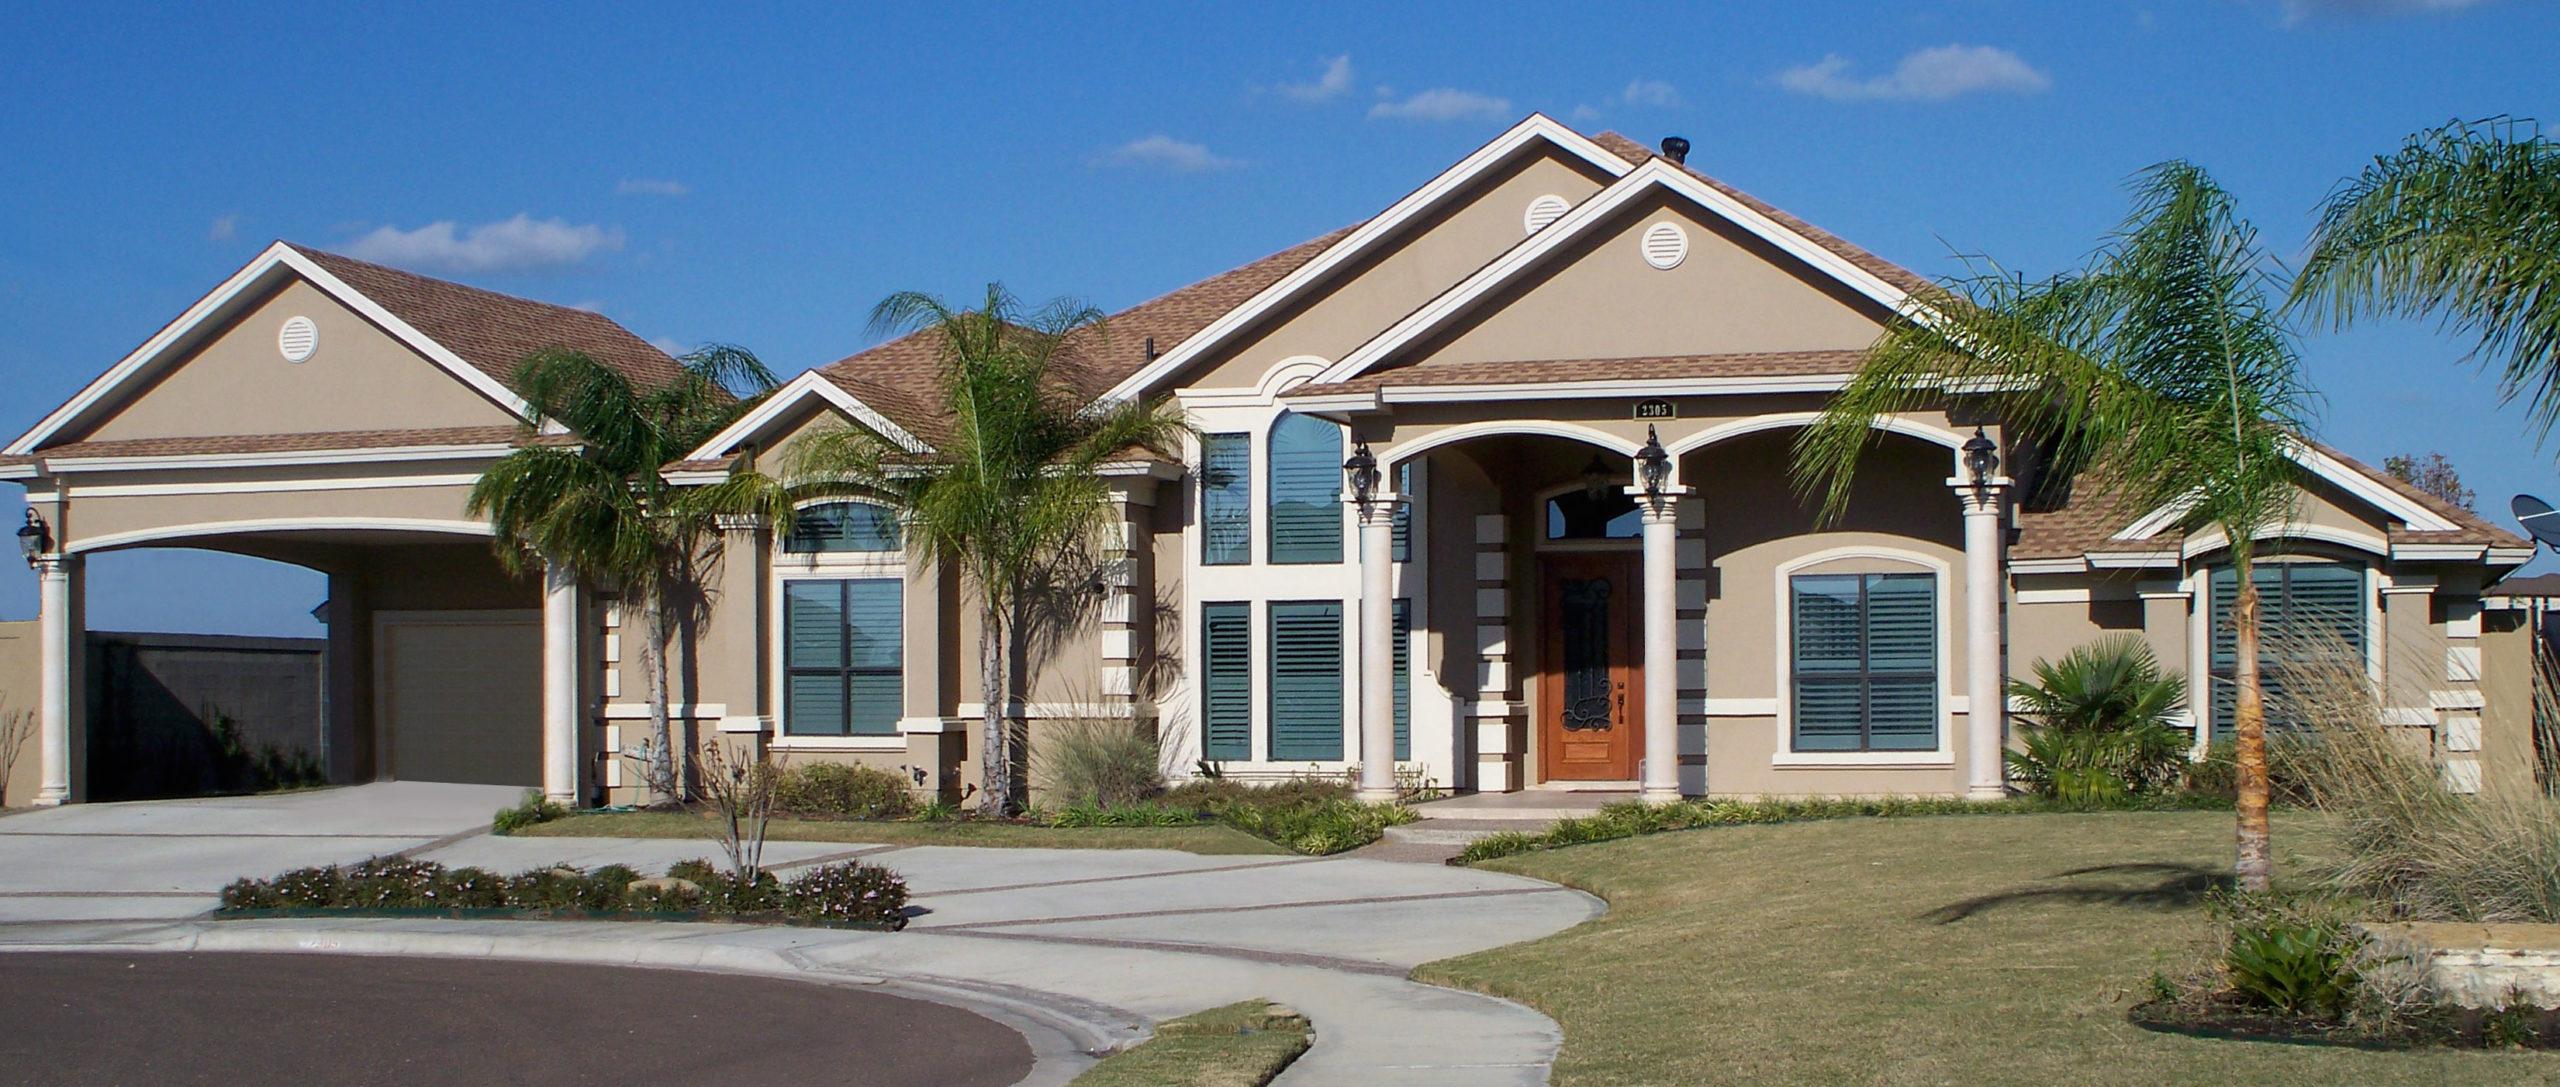 Poteet Homes